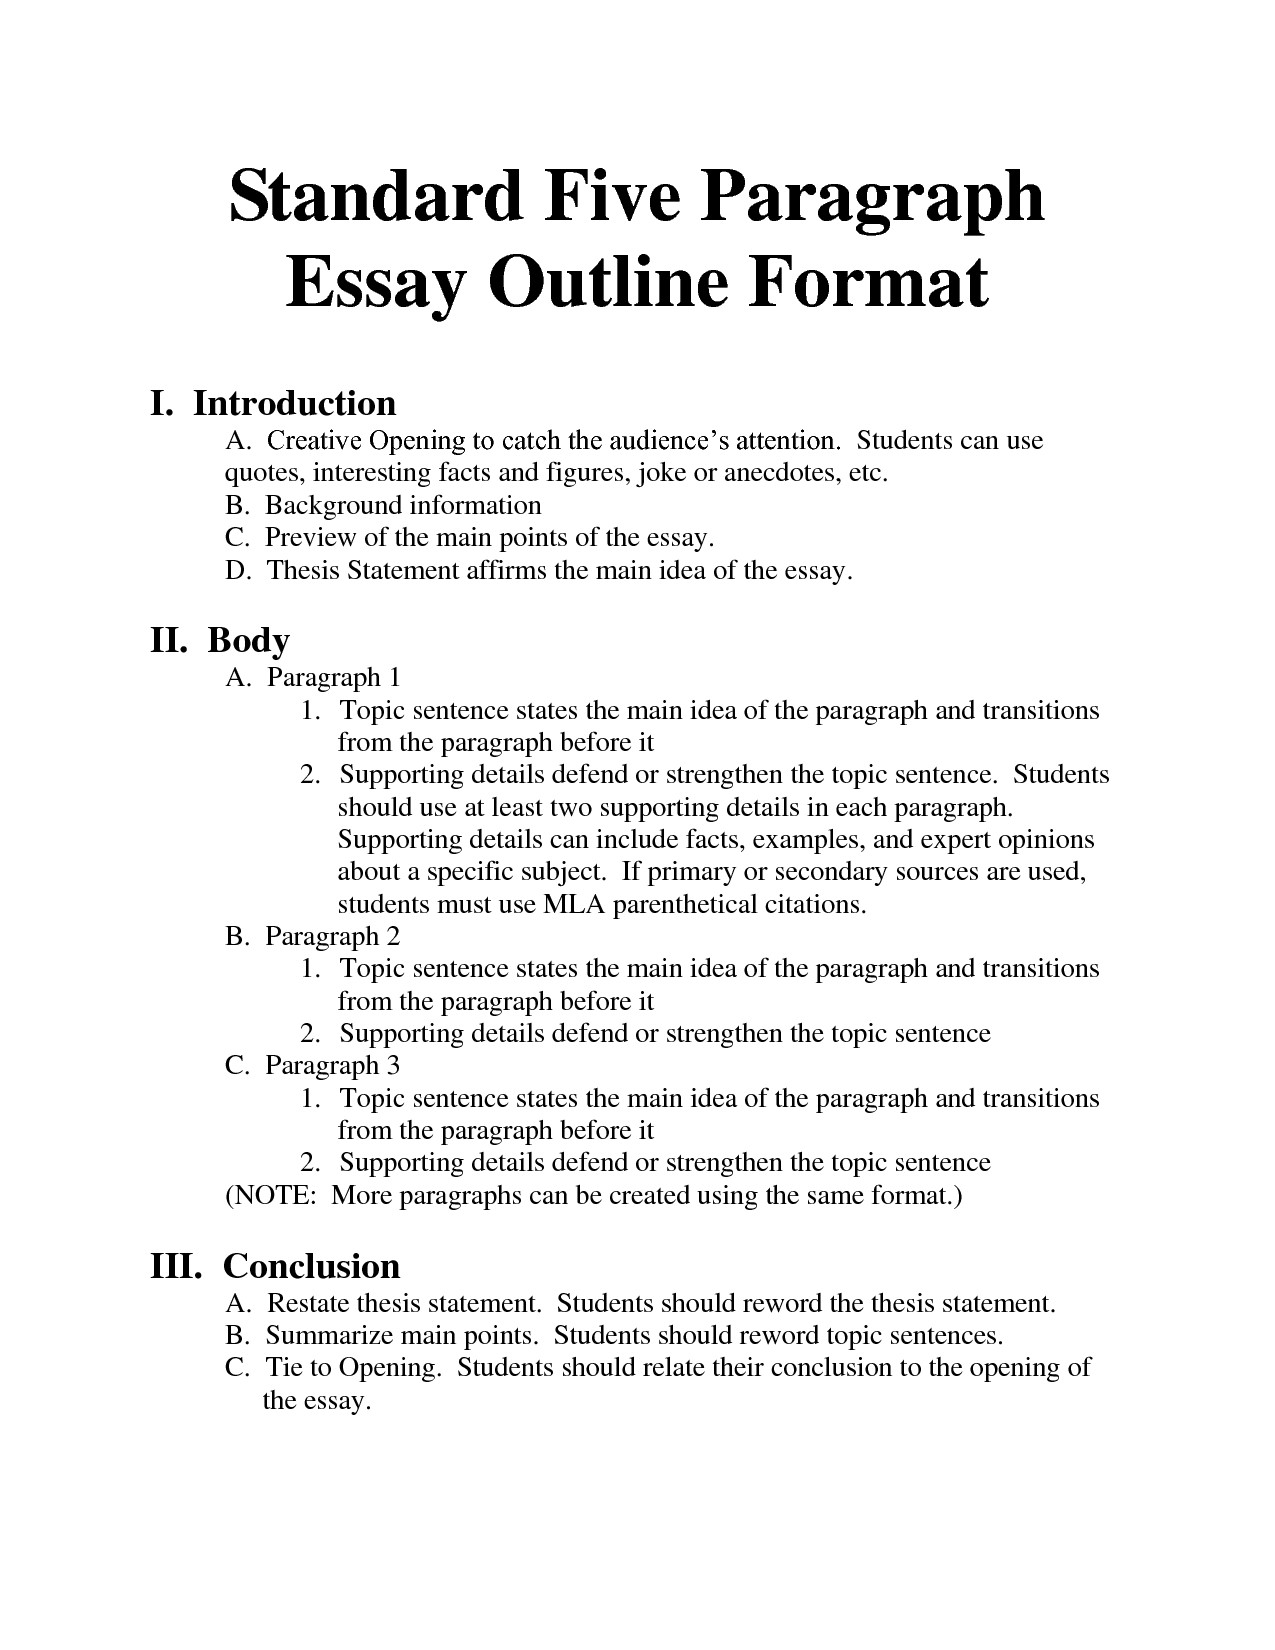 017 Personal Essay Format Writing Types Of Standard Bing Essays Homeschool Formidable Narrative For Scholarships Samples Graduate School Full